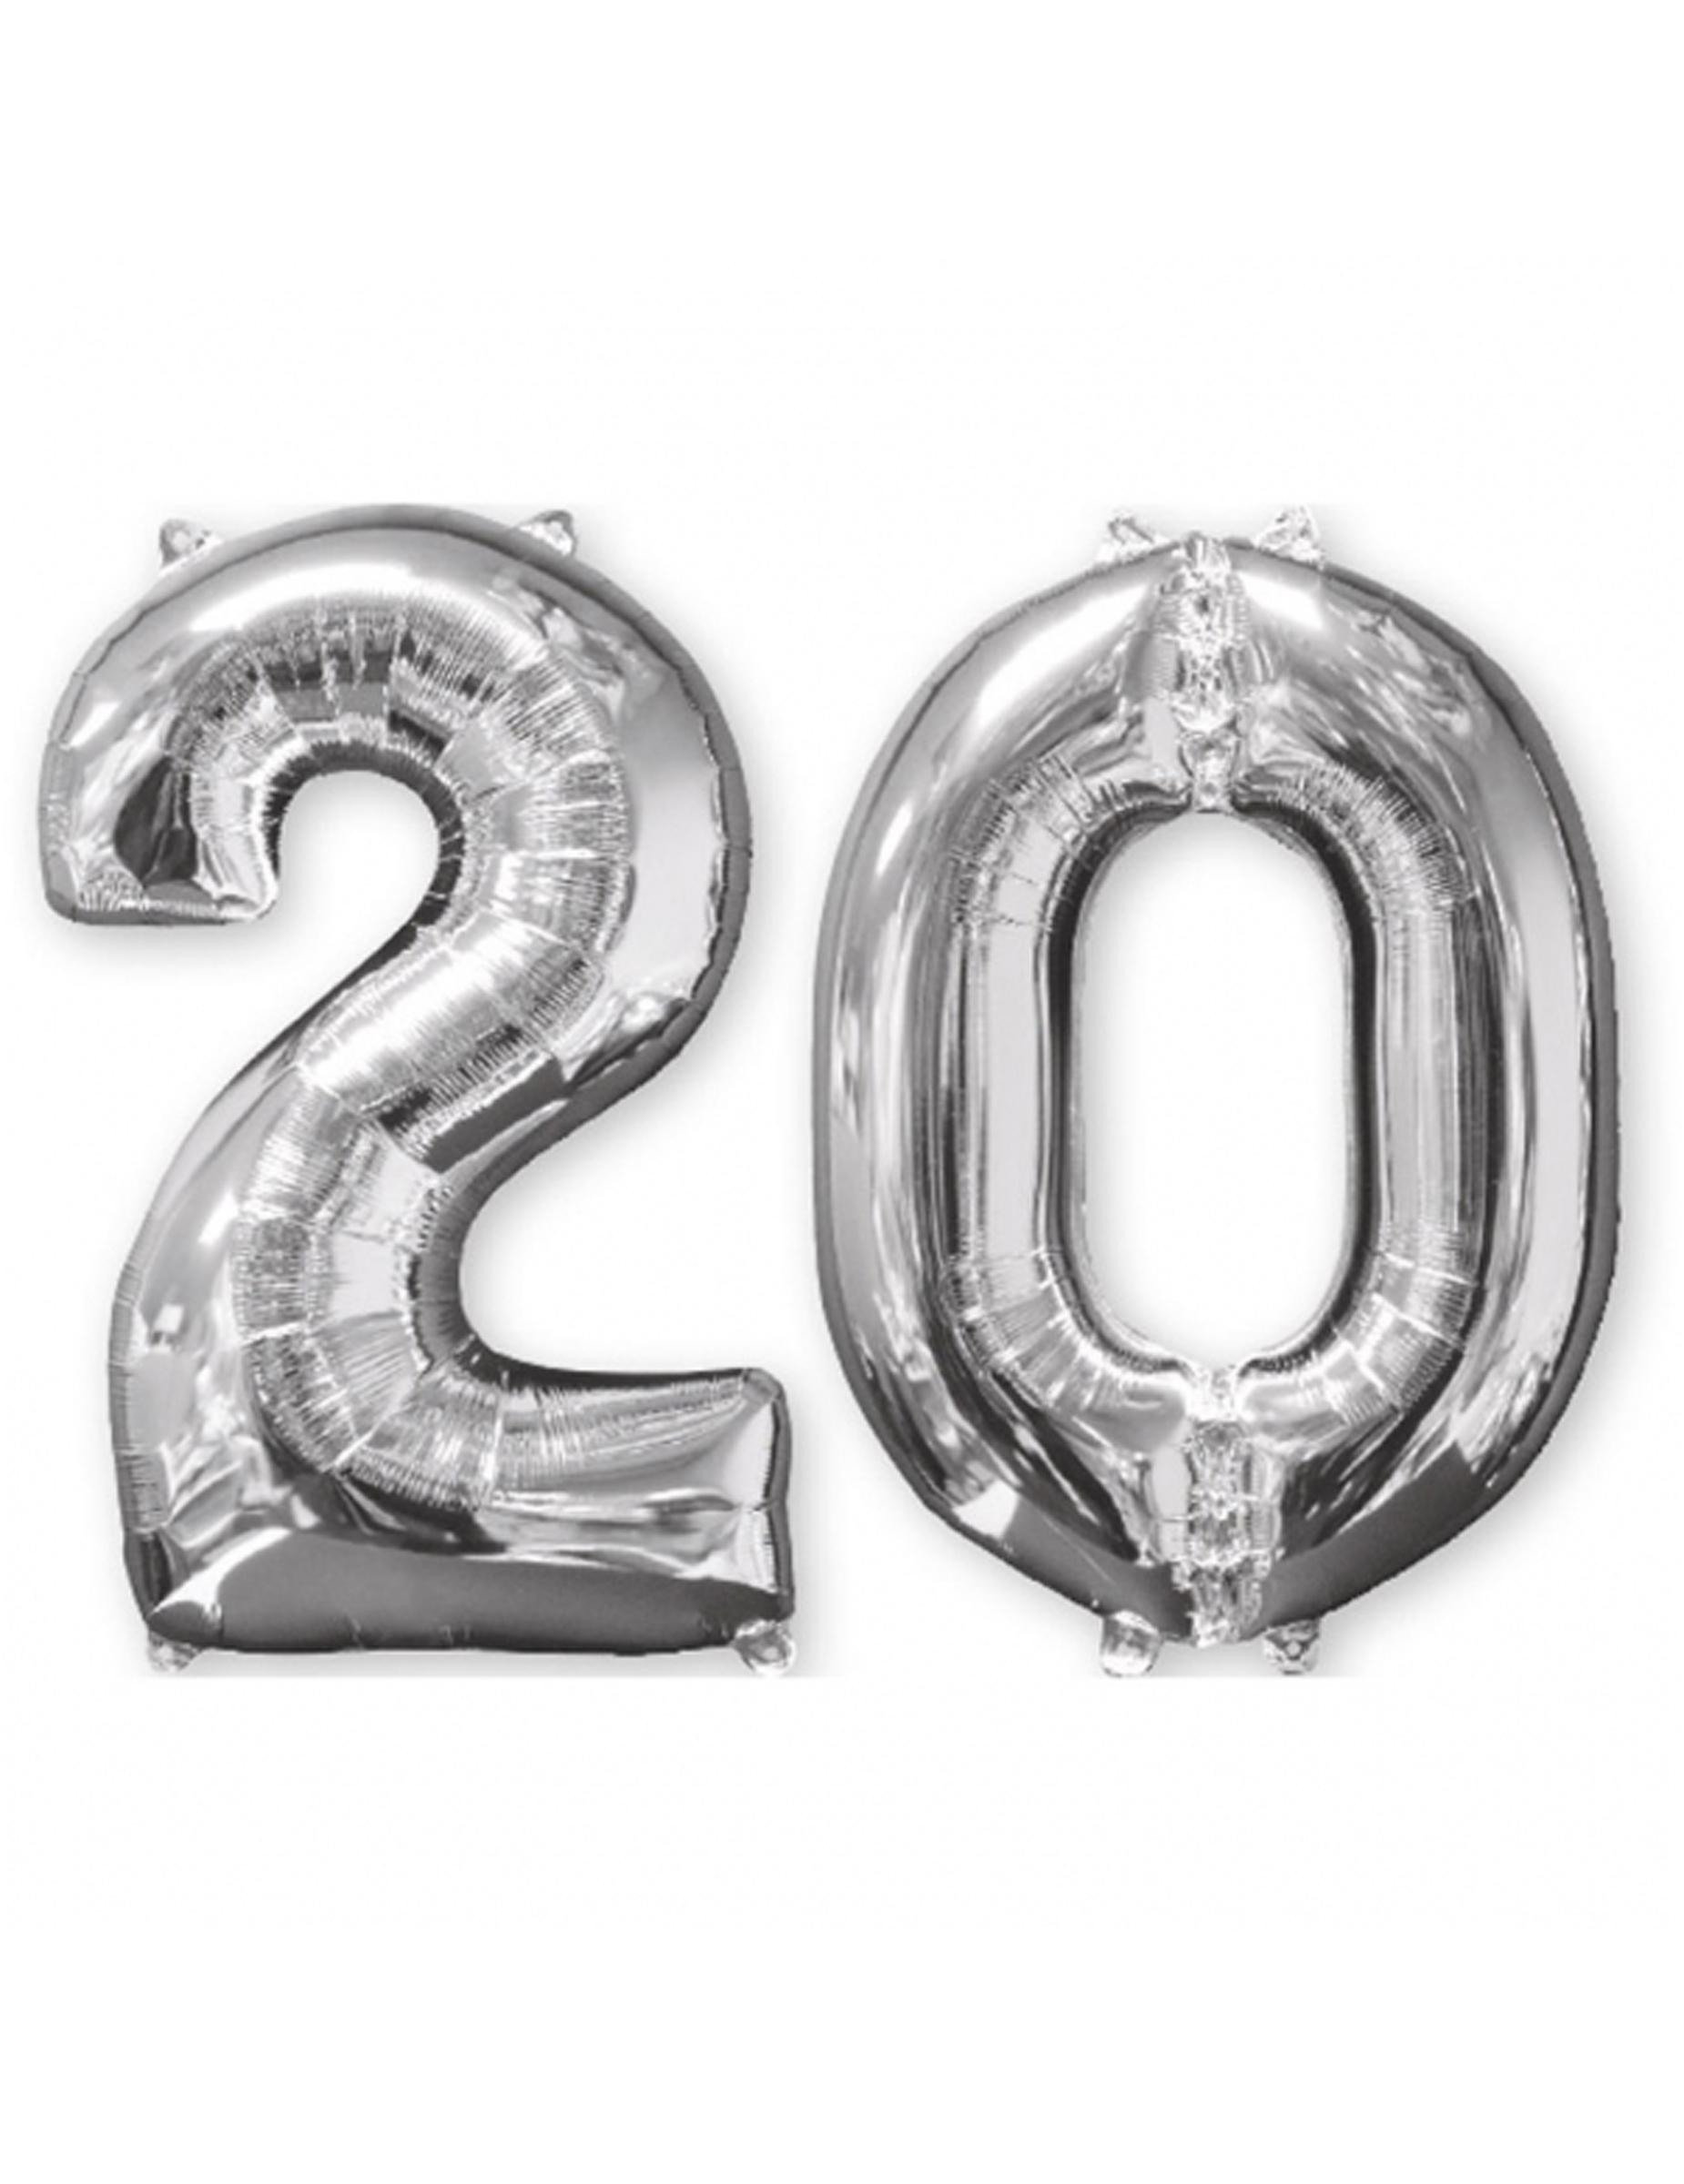 Ben noto Idee Compleanno 20 Anni XQ66 » Regardsdefemmes IL24